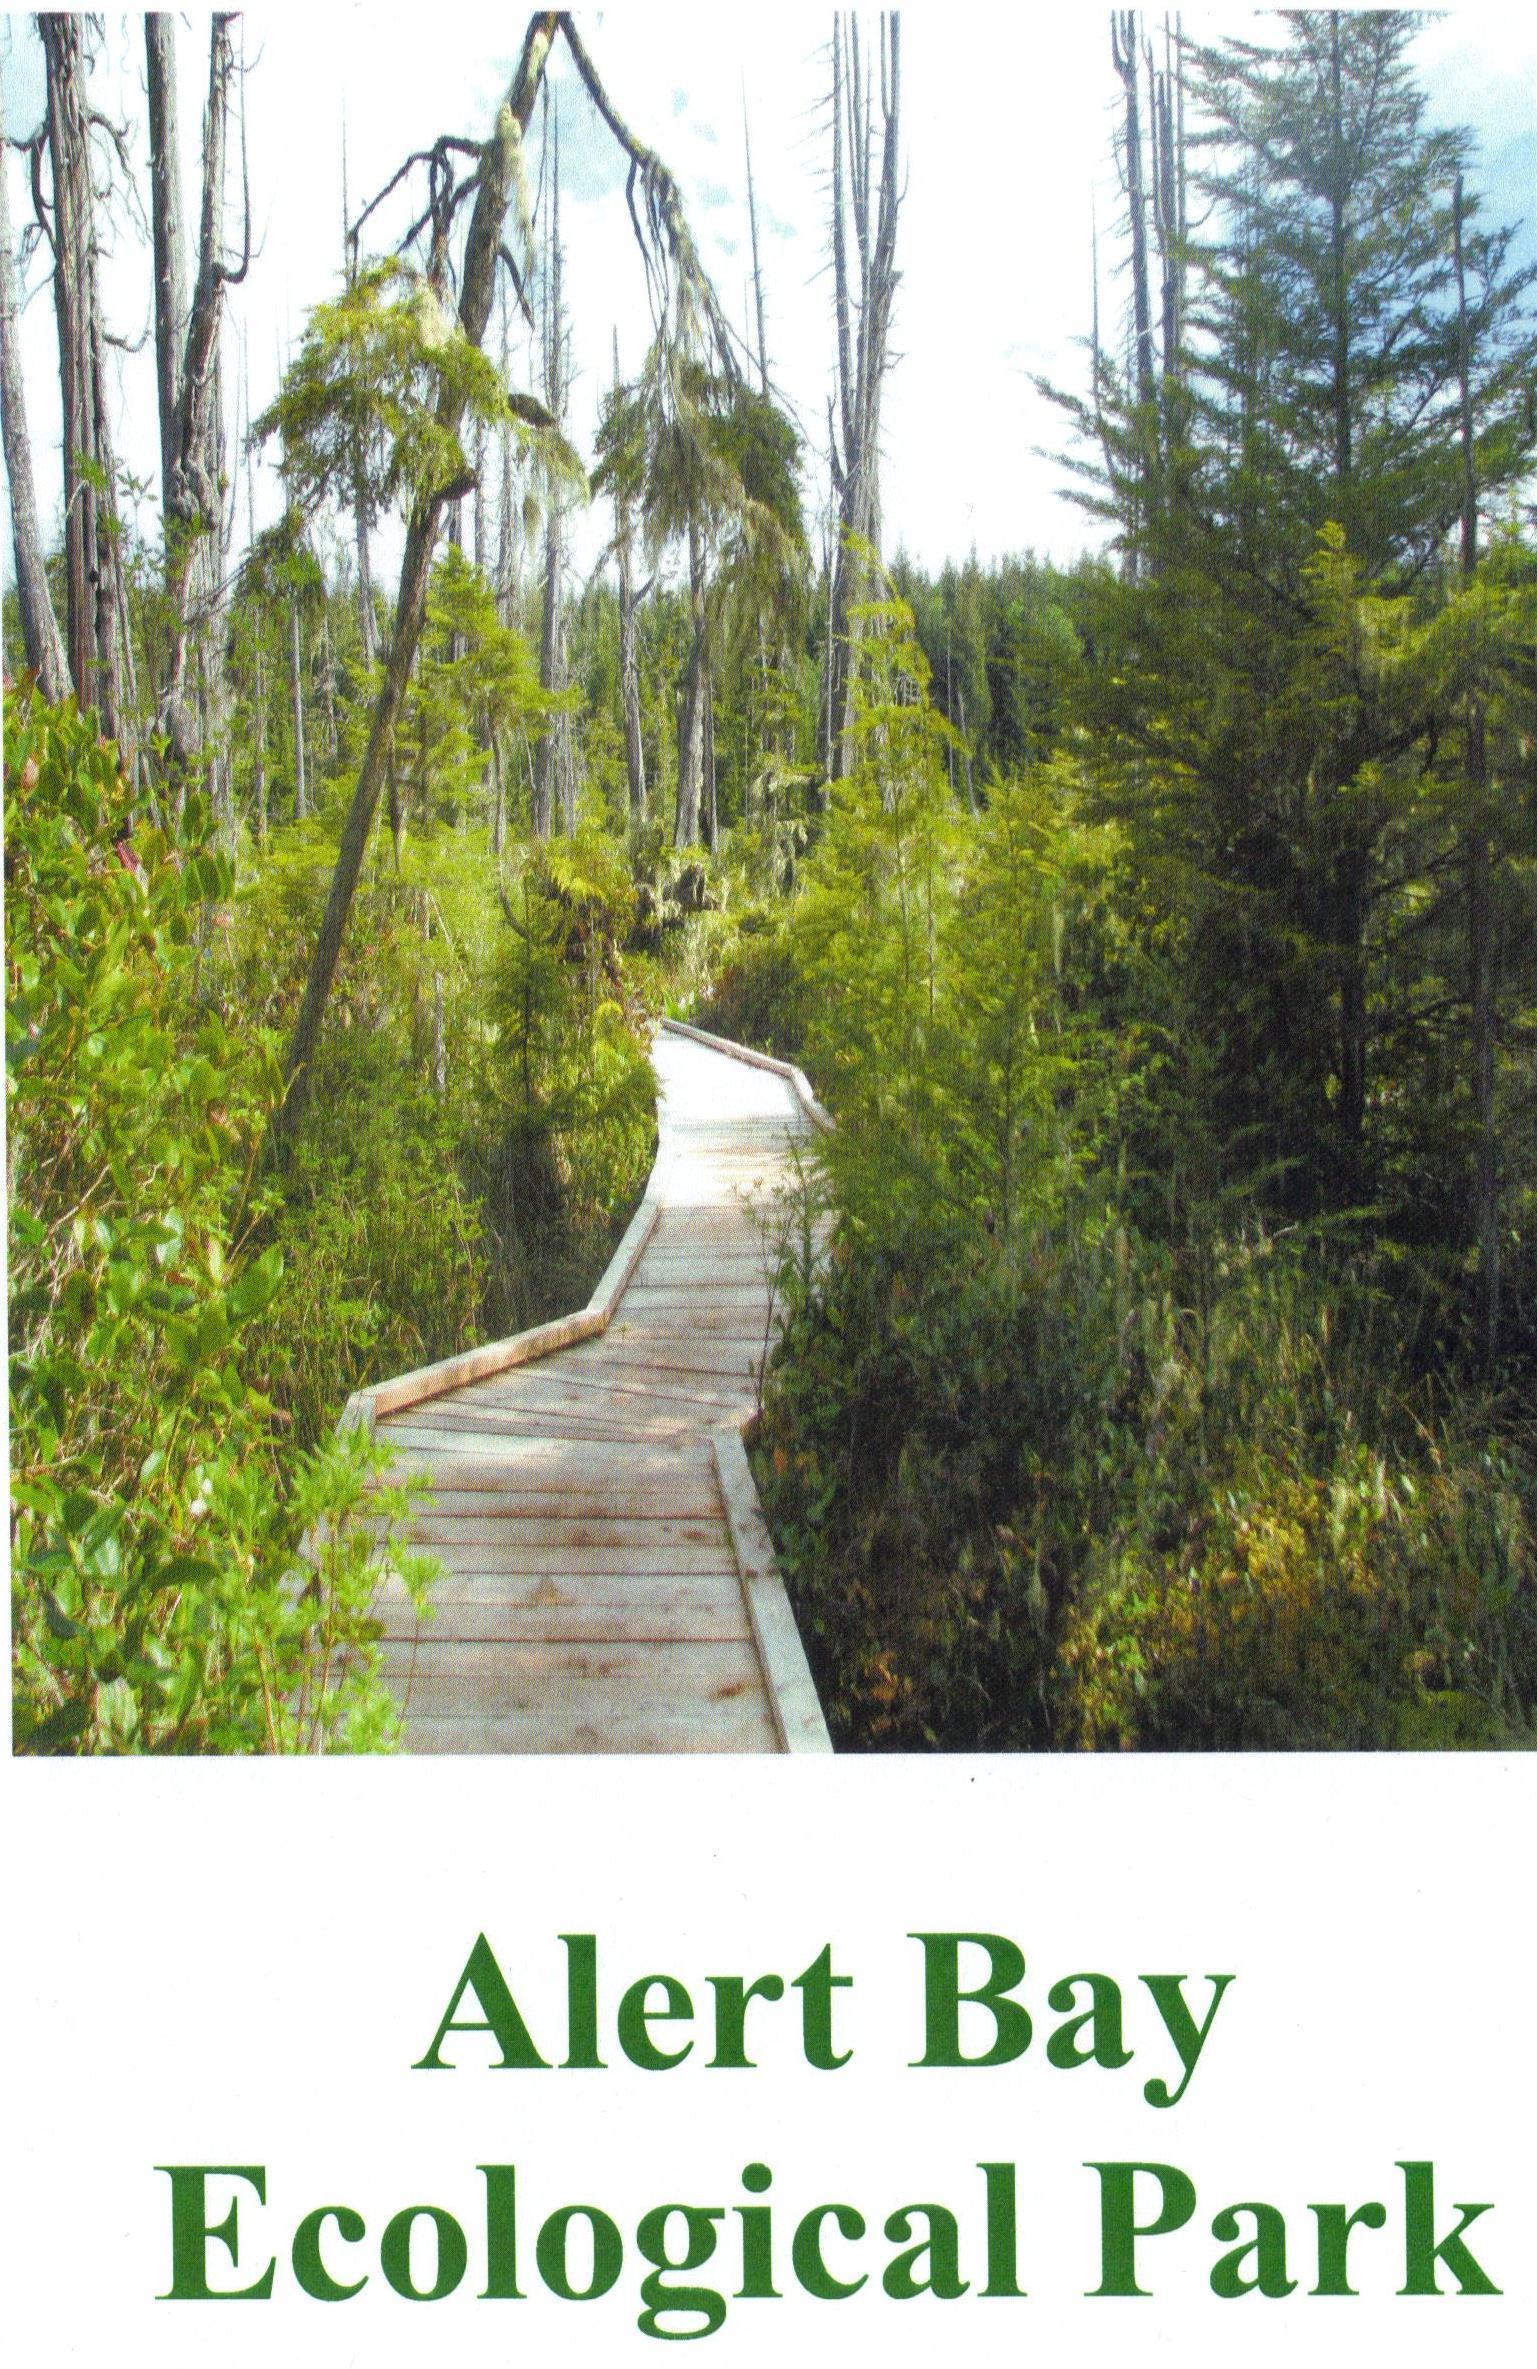 Ecological Park Front Cover.jpg